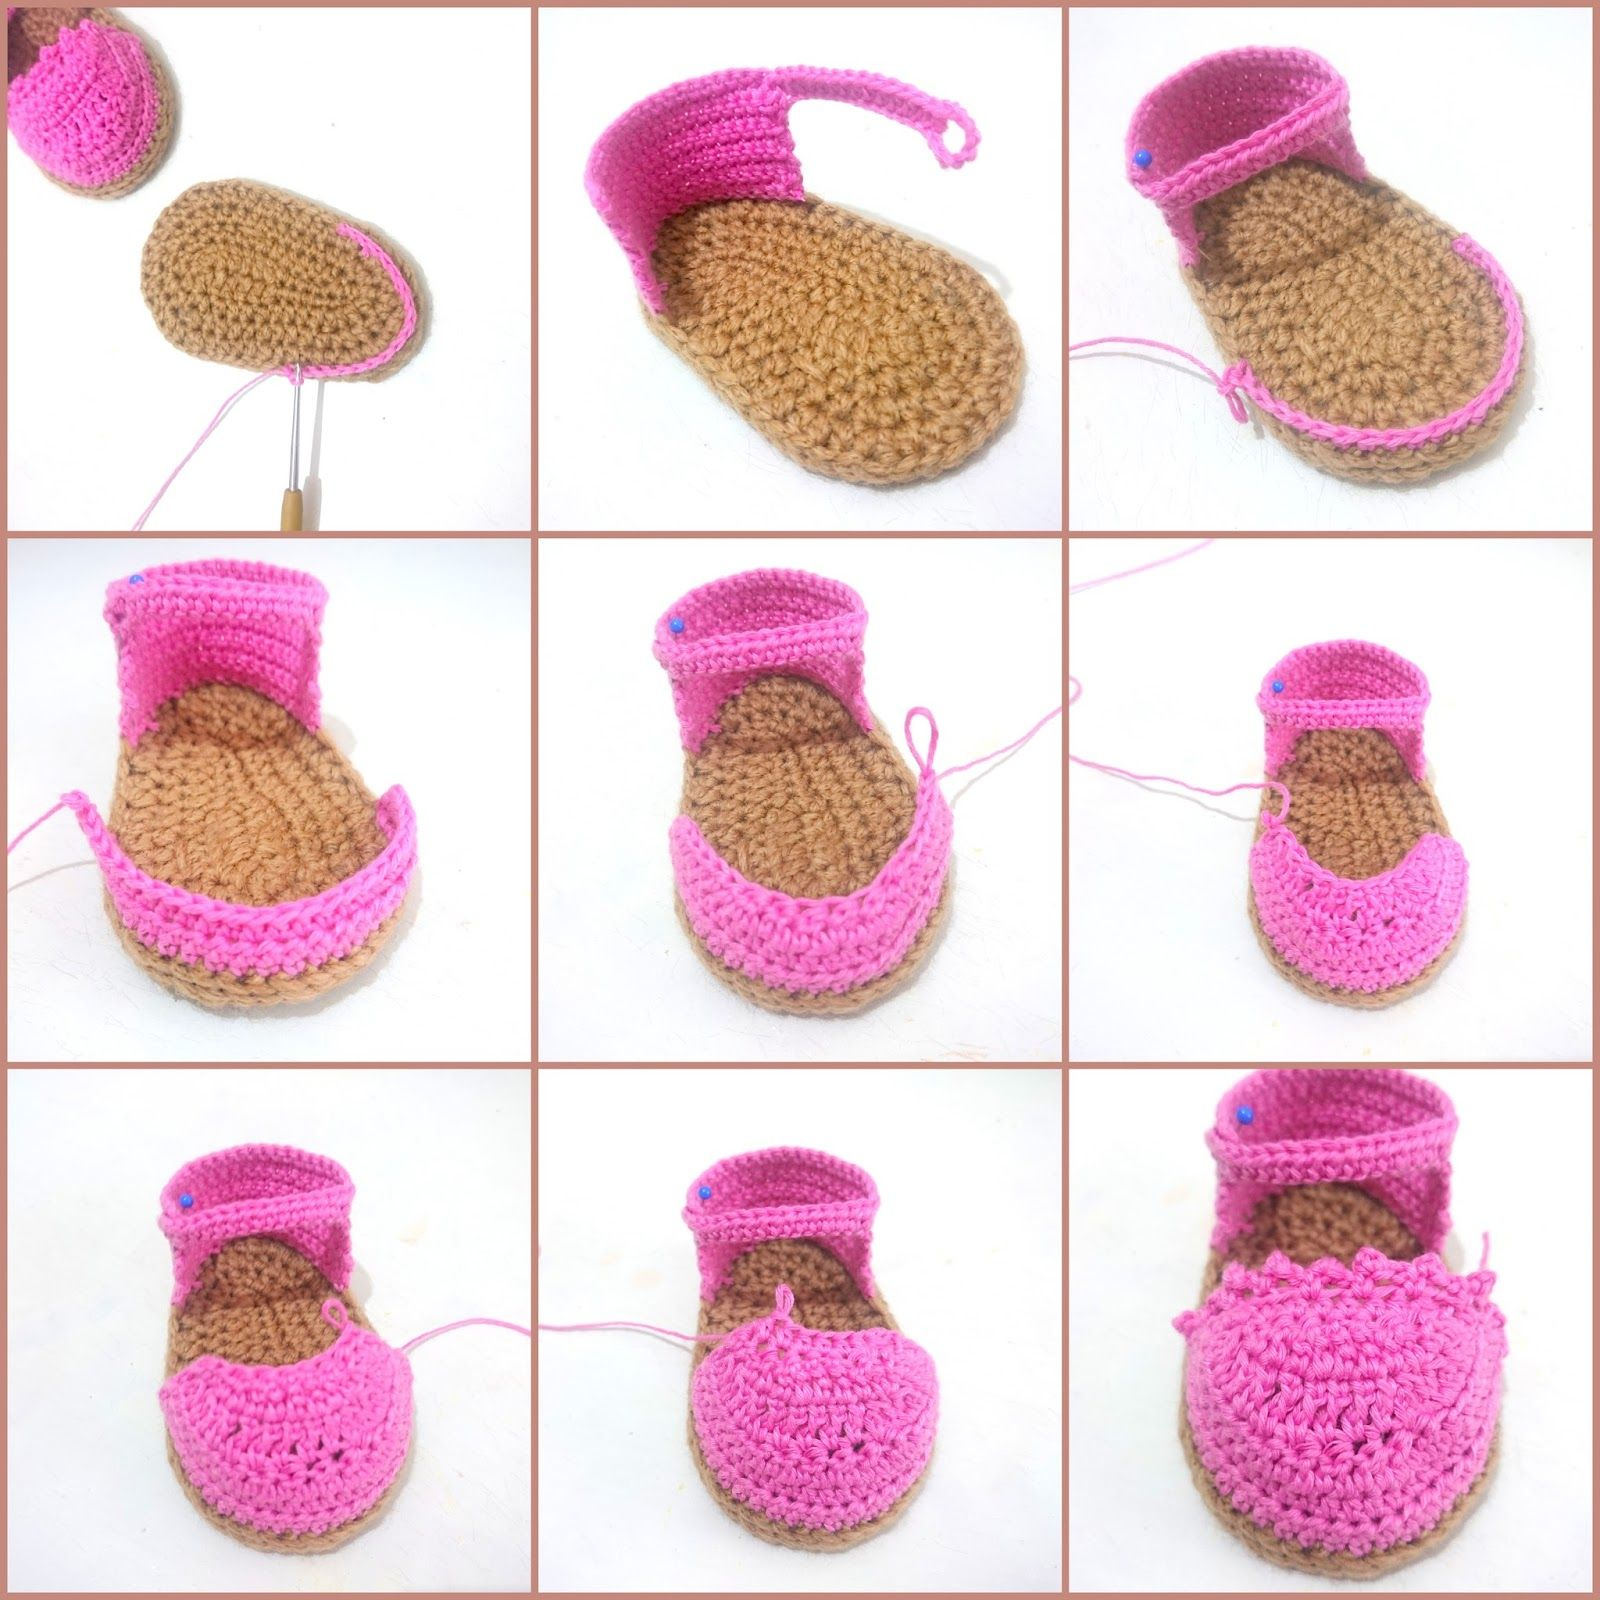 Crochet baby espadrille shoes free pattern in turkish tutorial crochet baby espadrille shoes free pattern in turkish tutorial bebek espadril yapm hva bankloansurffo Images